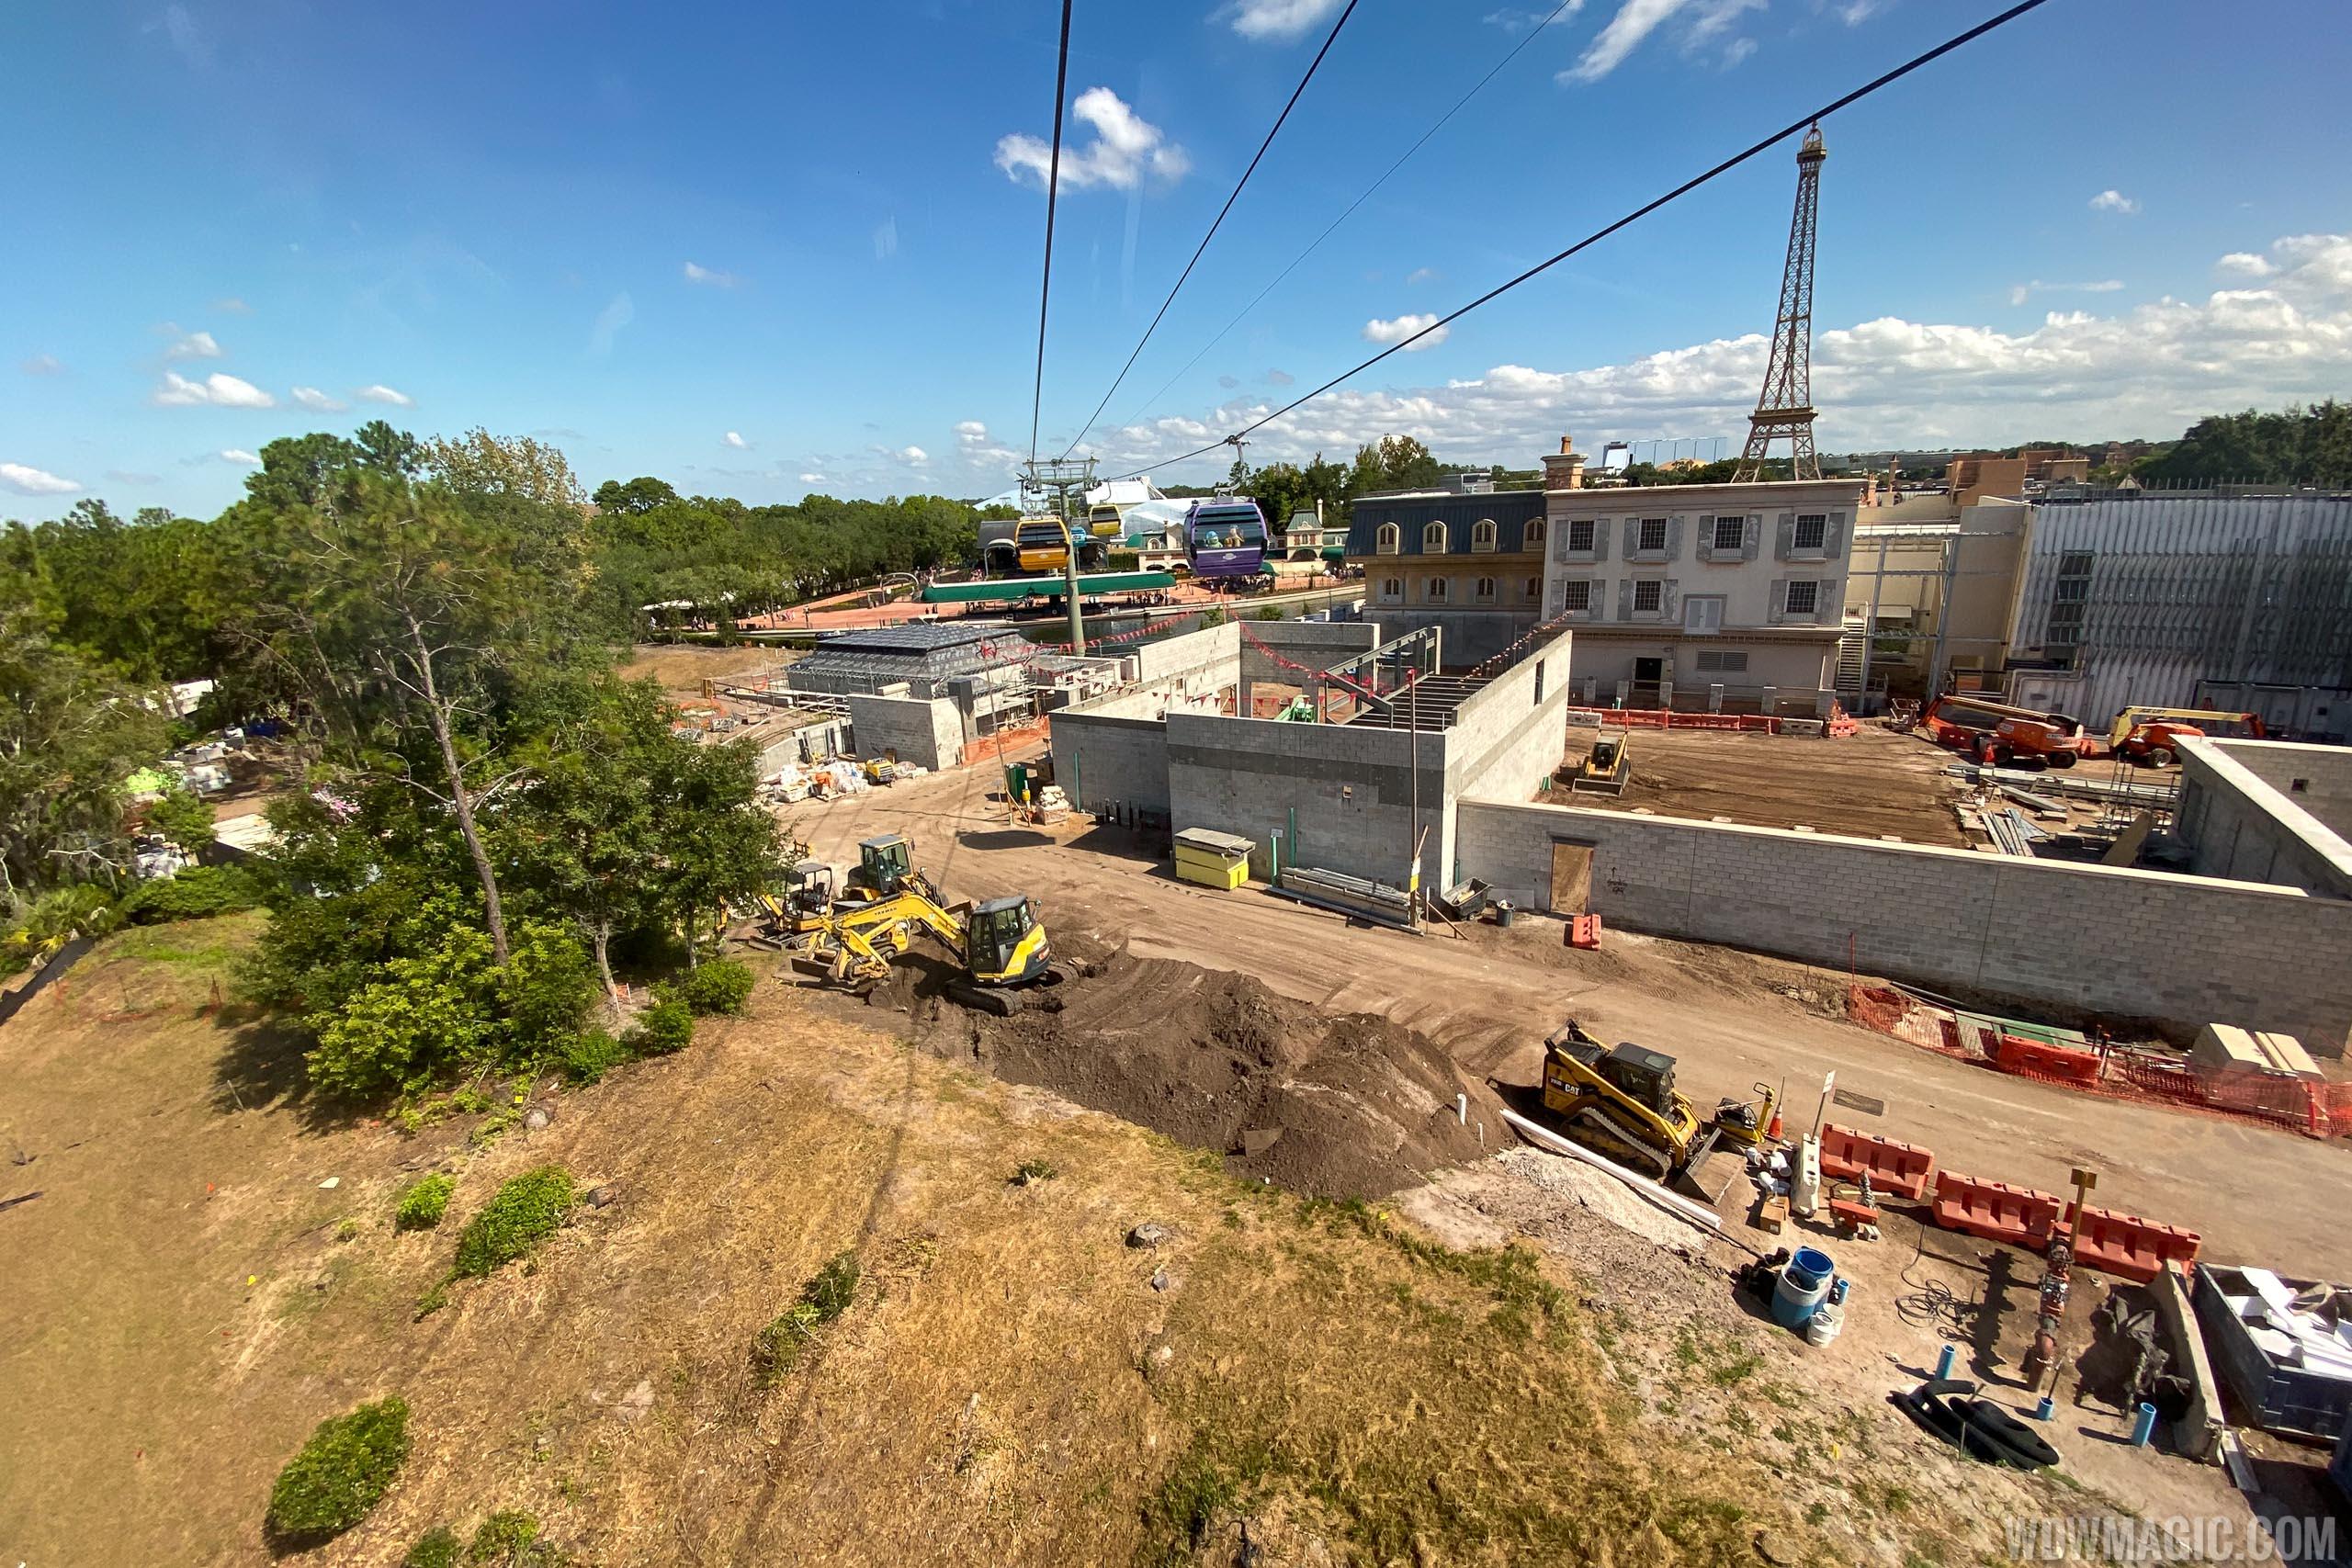 Remy's Ratatouille Adventure construction - September 2019